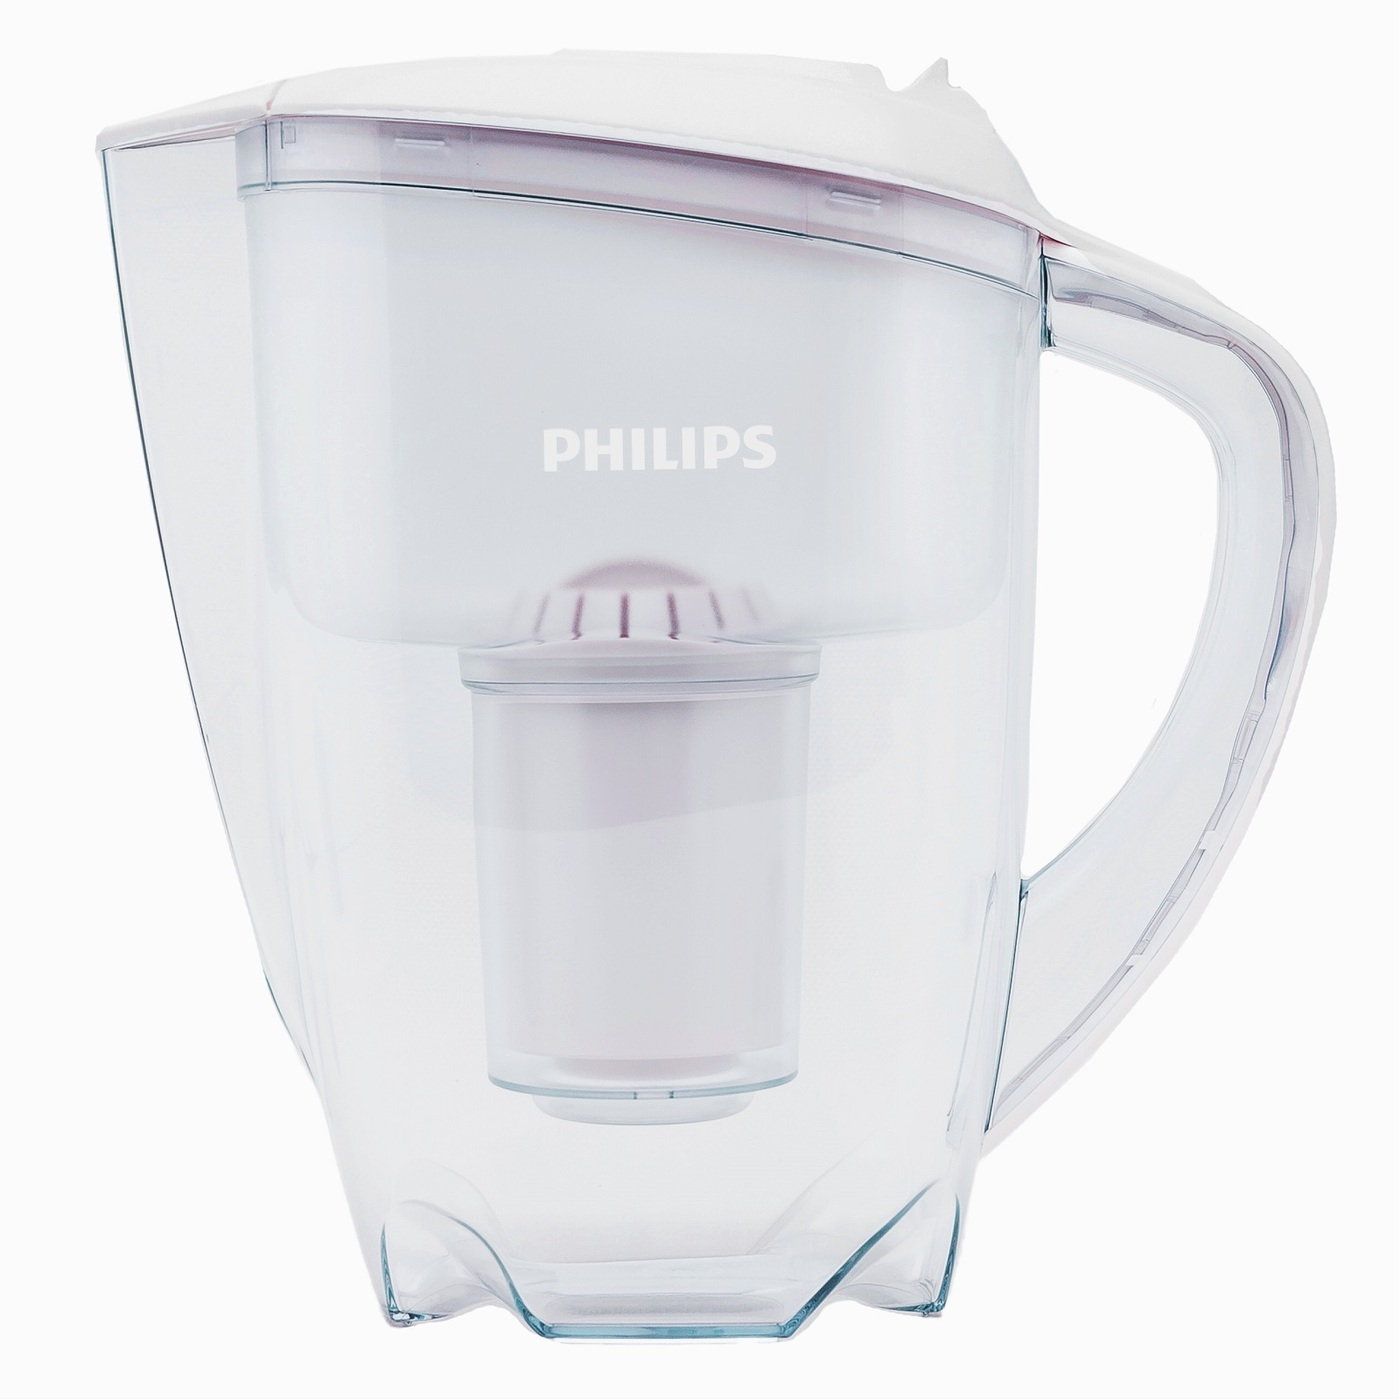 Philips AWP2920/10 с картриджем AWP200